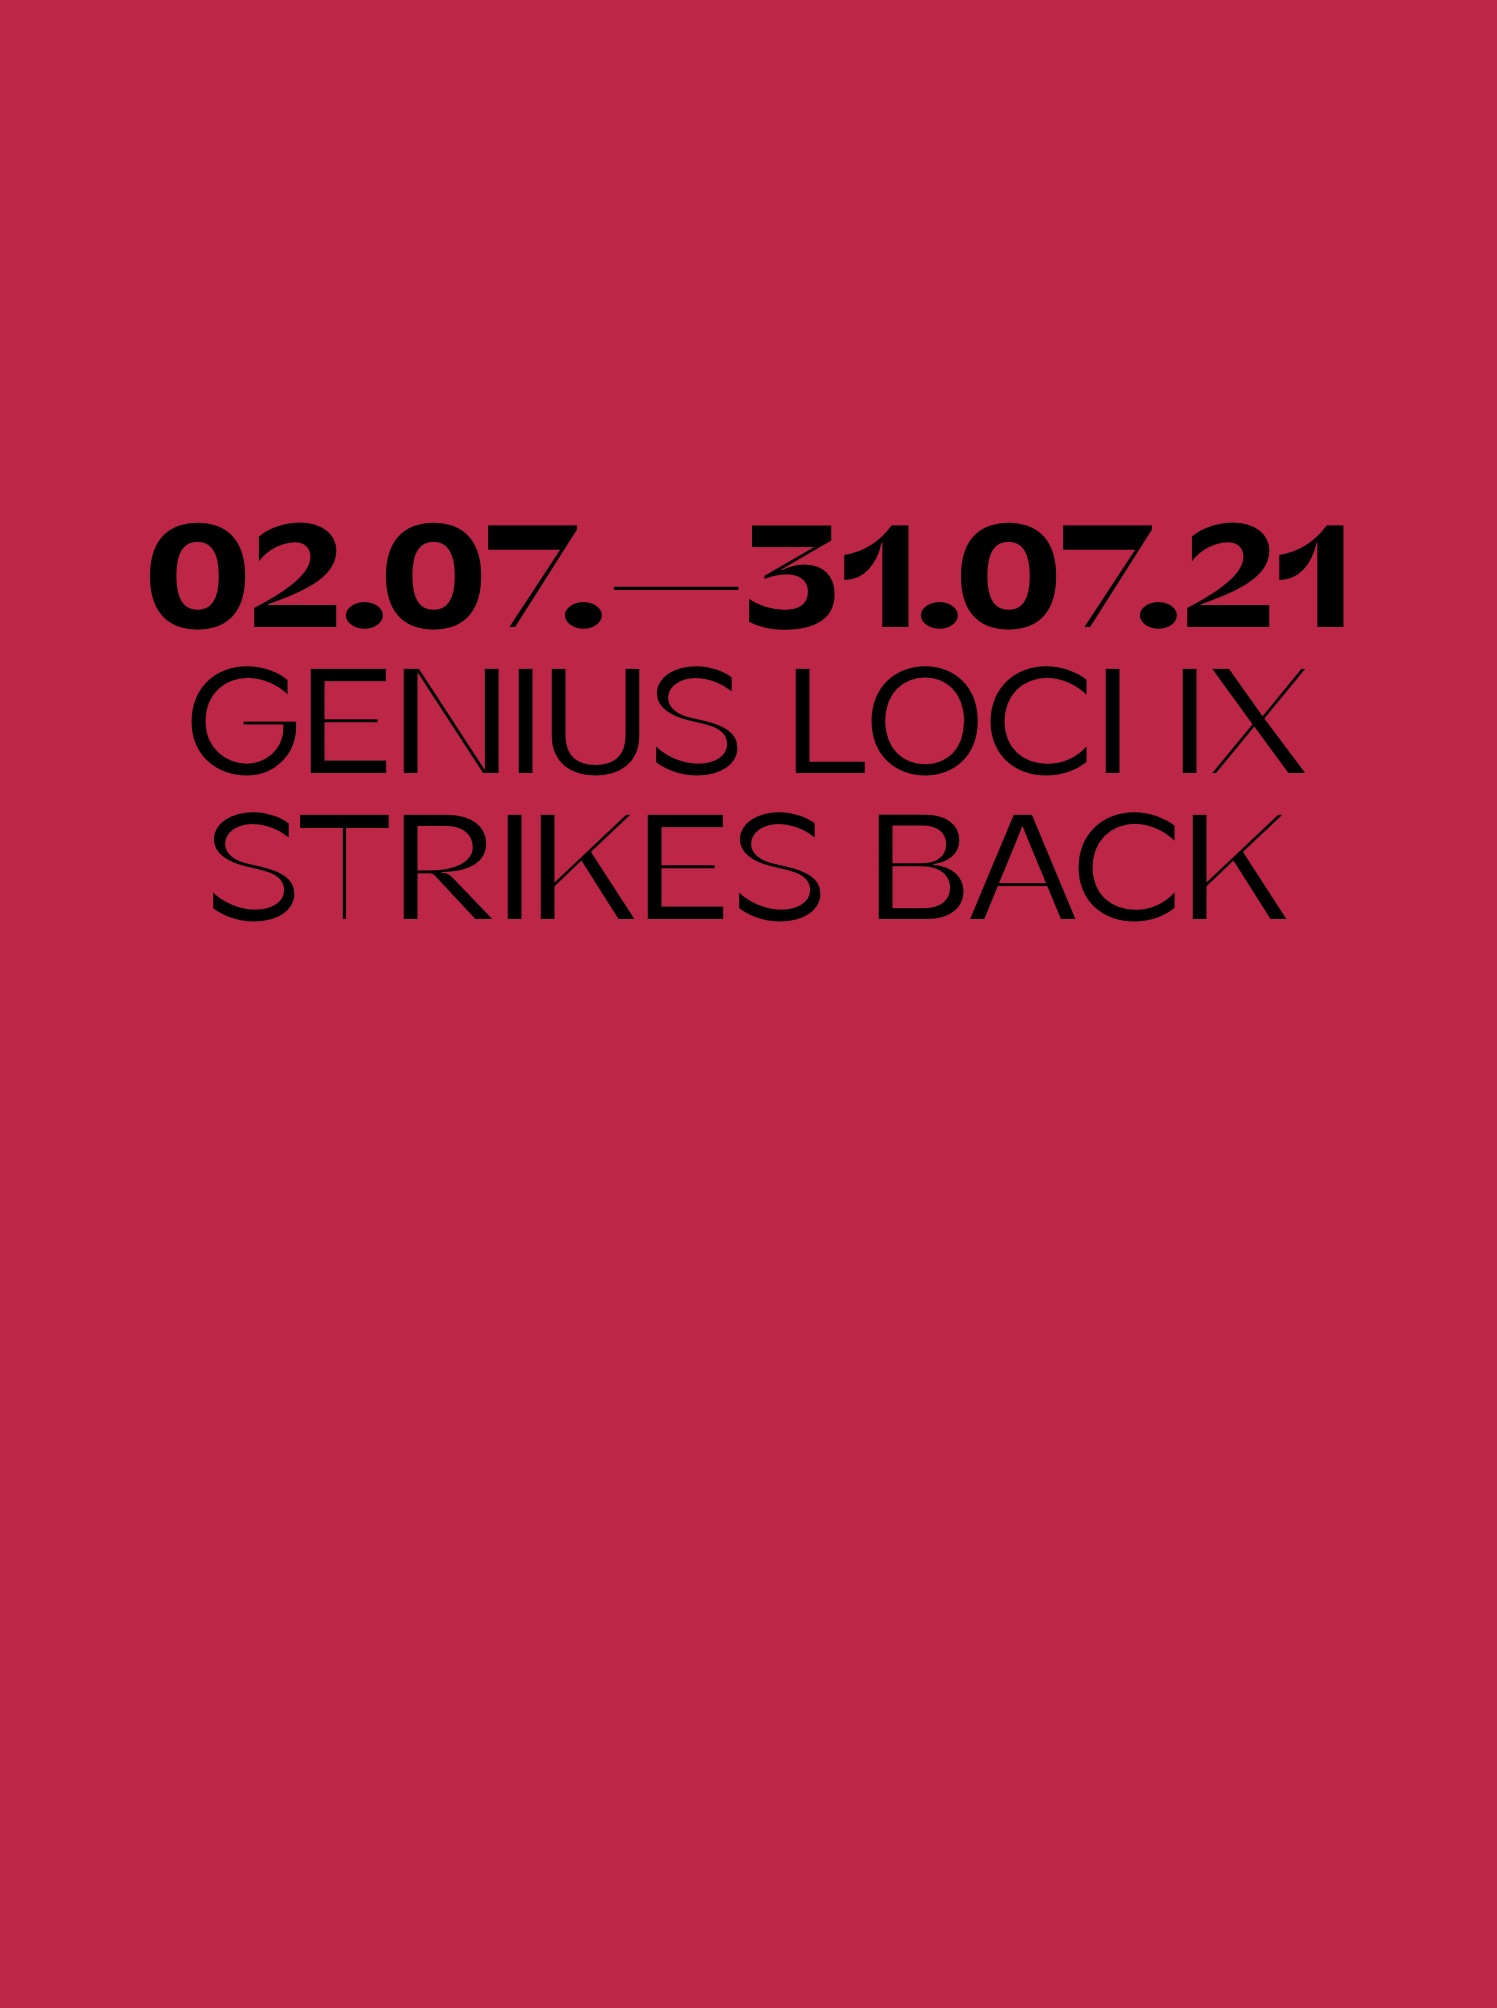 GENIUS LOCI IX - STRIKES BACK Text